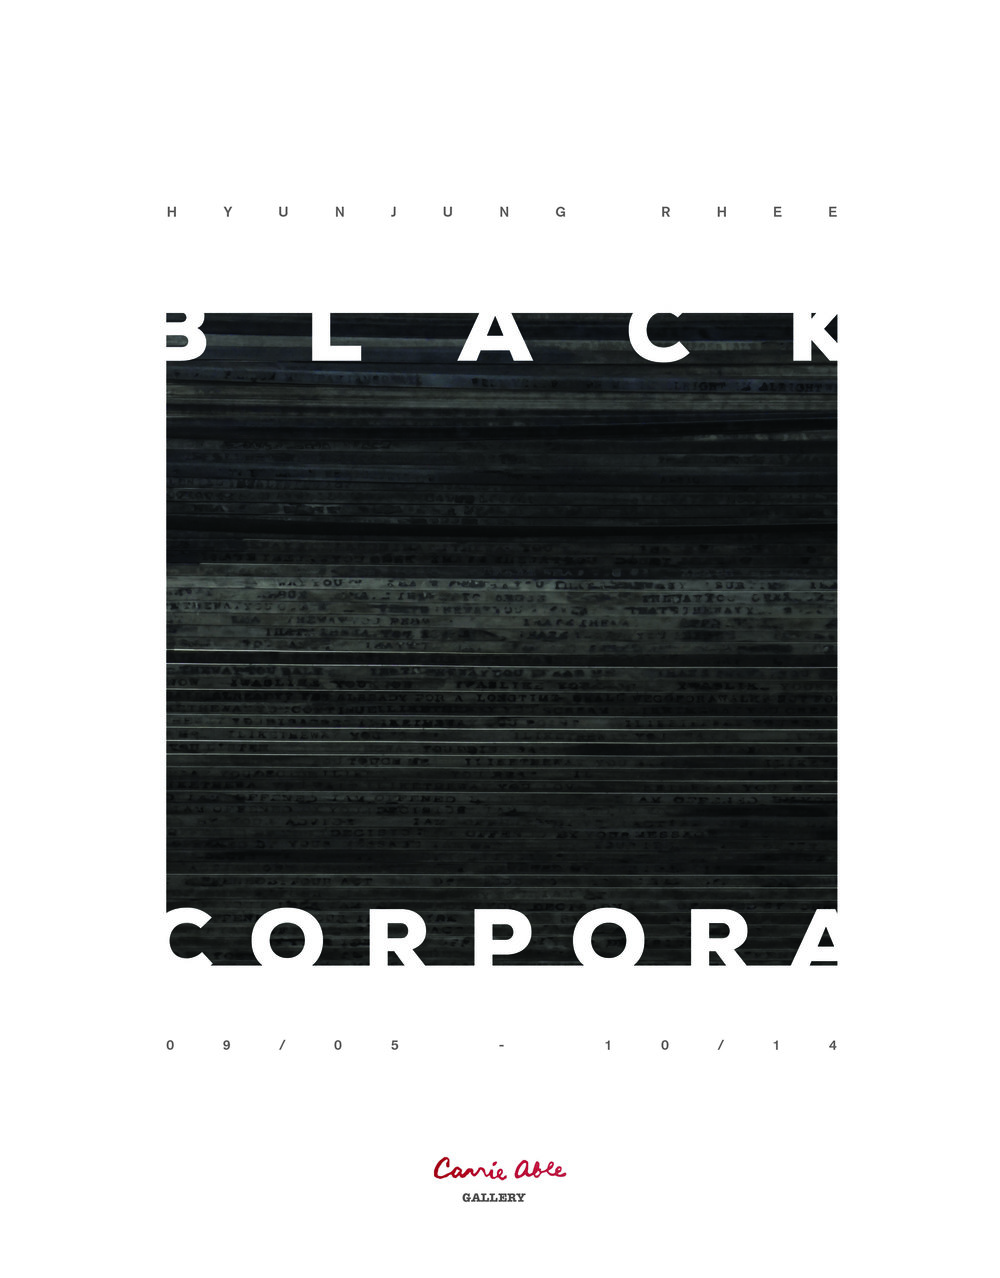 Catalogue Black Corpora.jpg